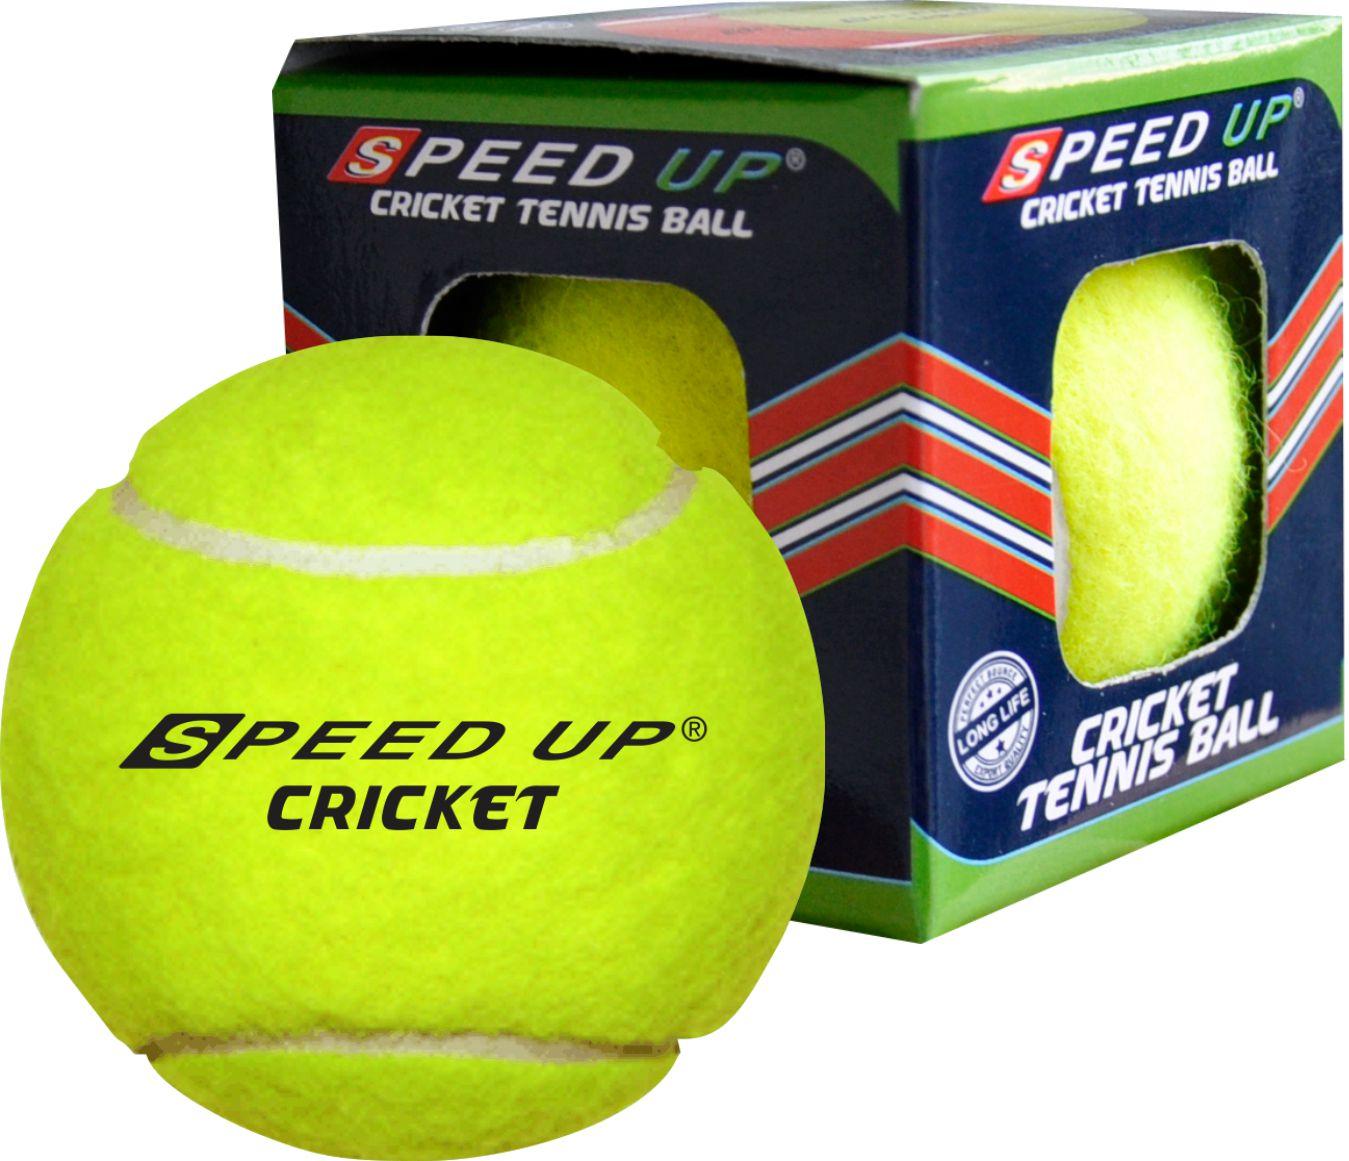 TENNIS BALL PACKING